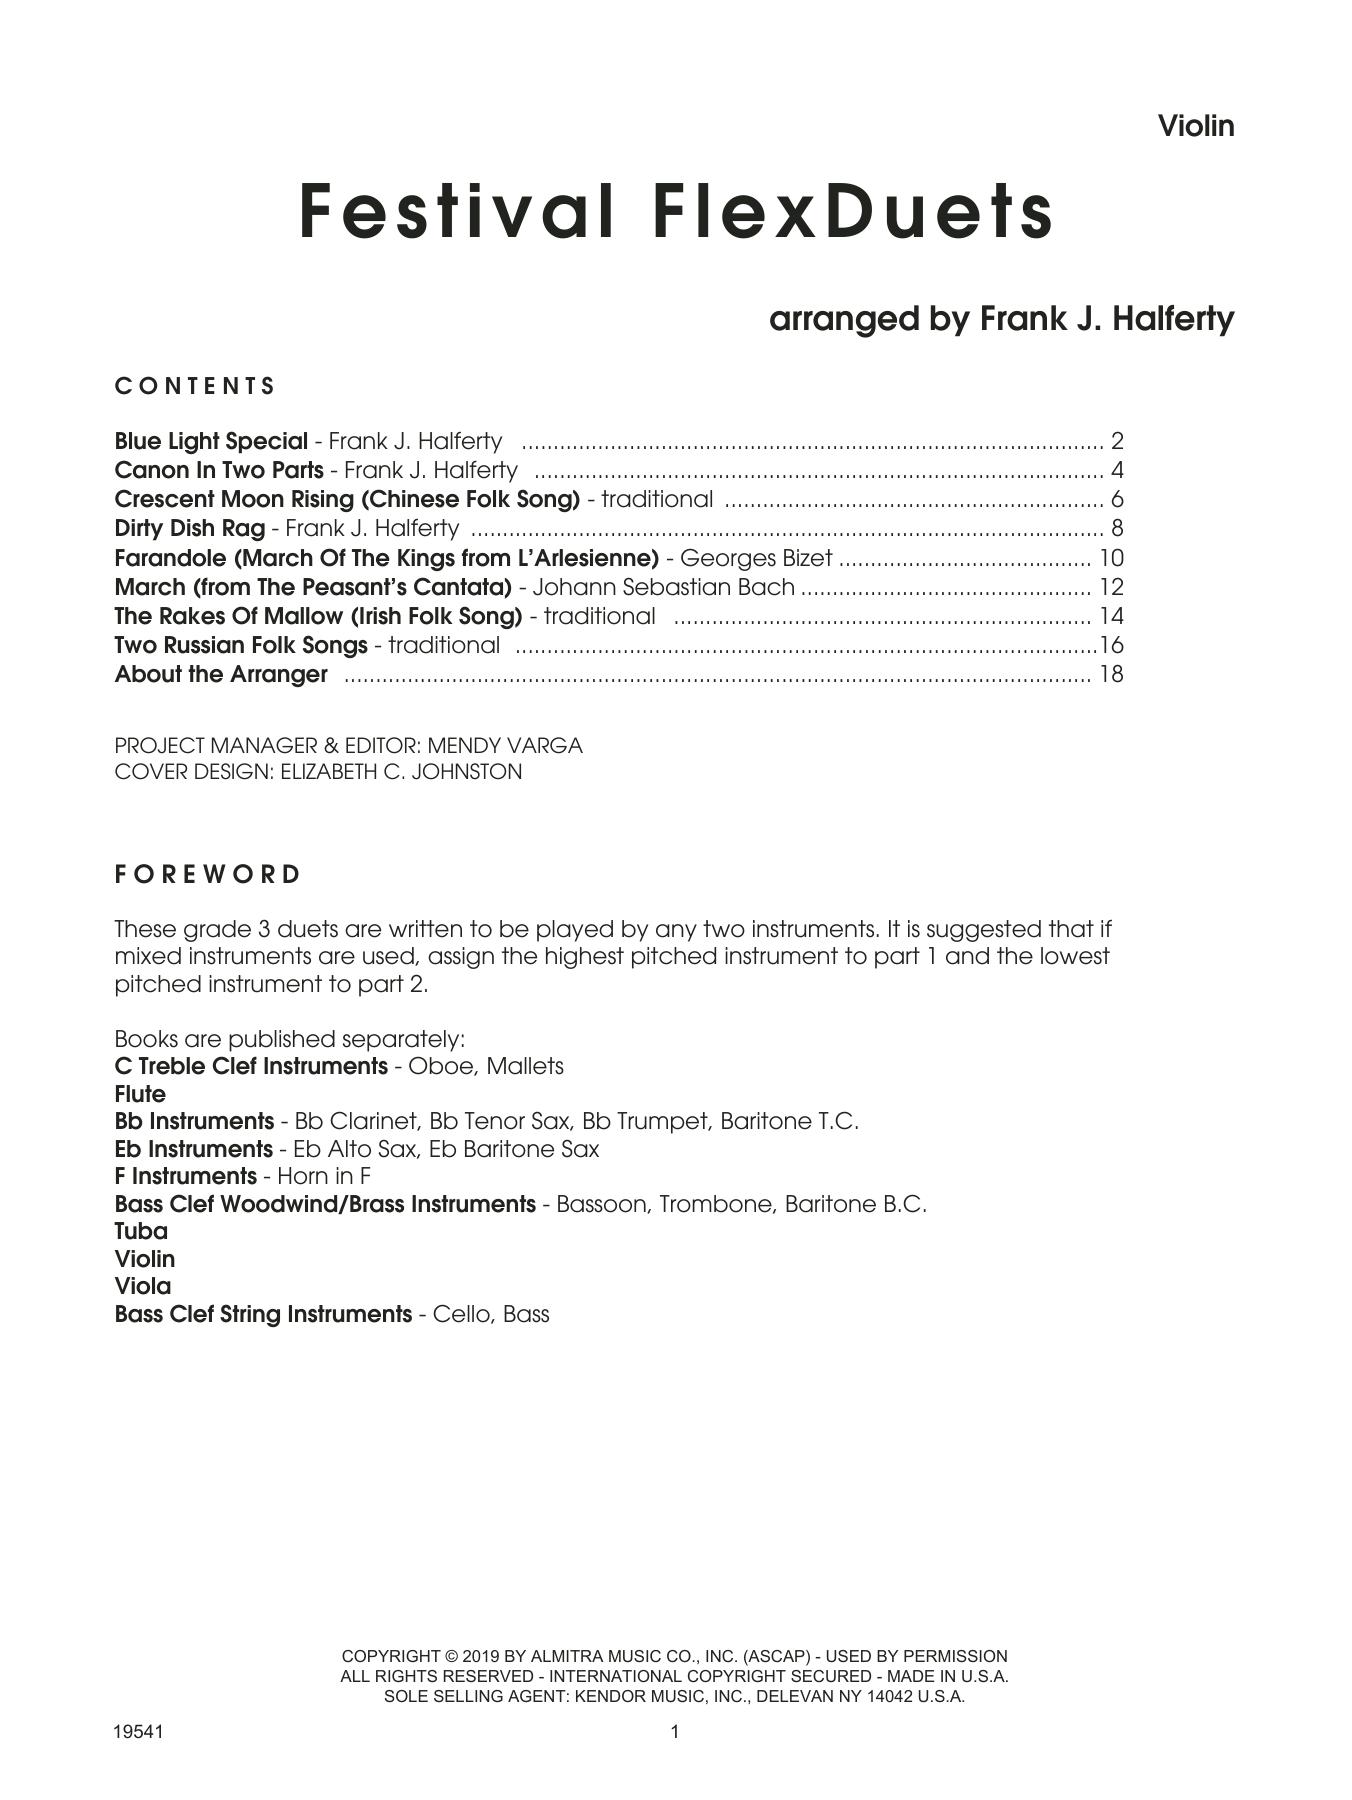 Festival FlexDuets - Violin Sheet Music